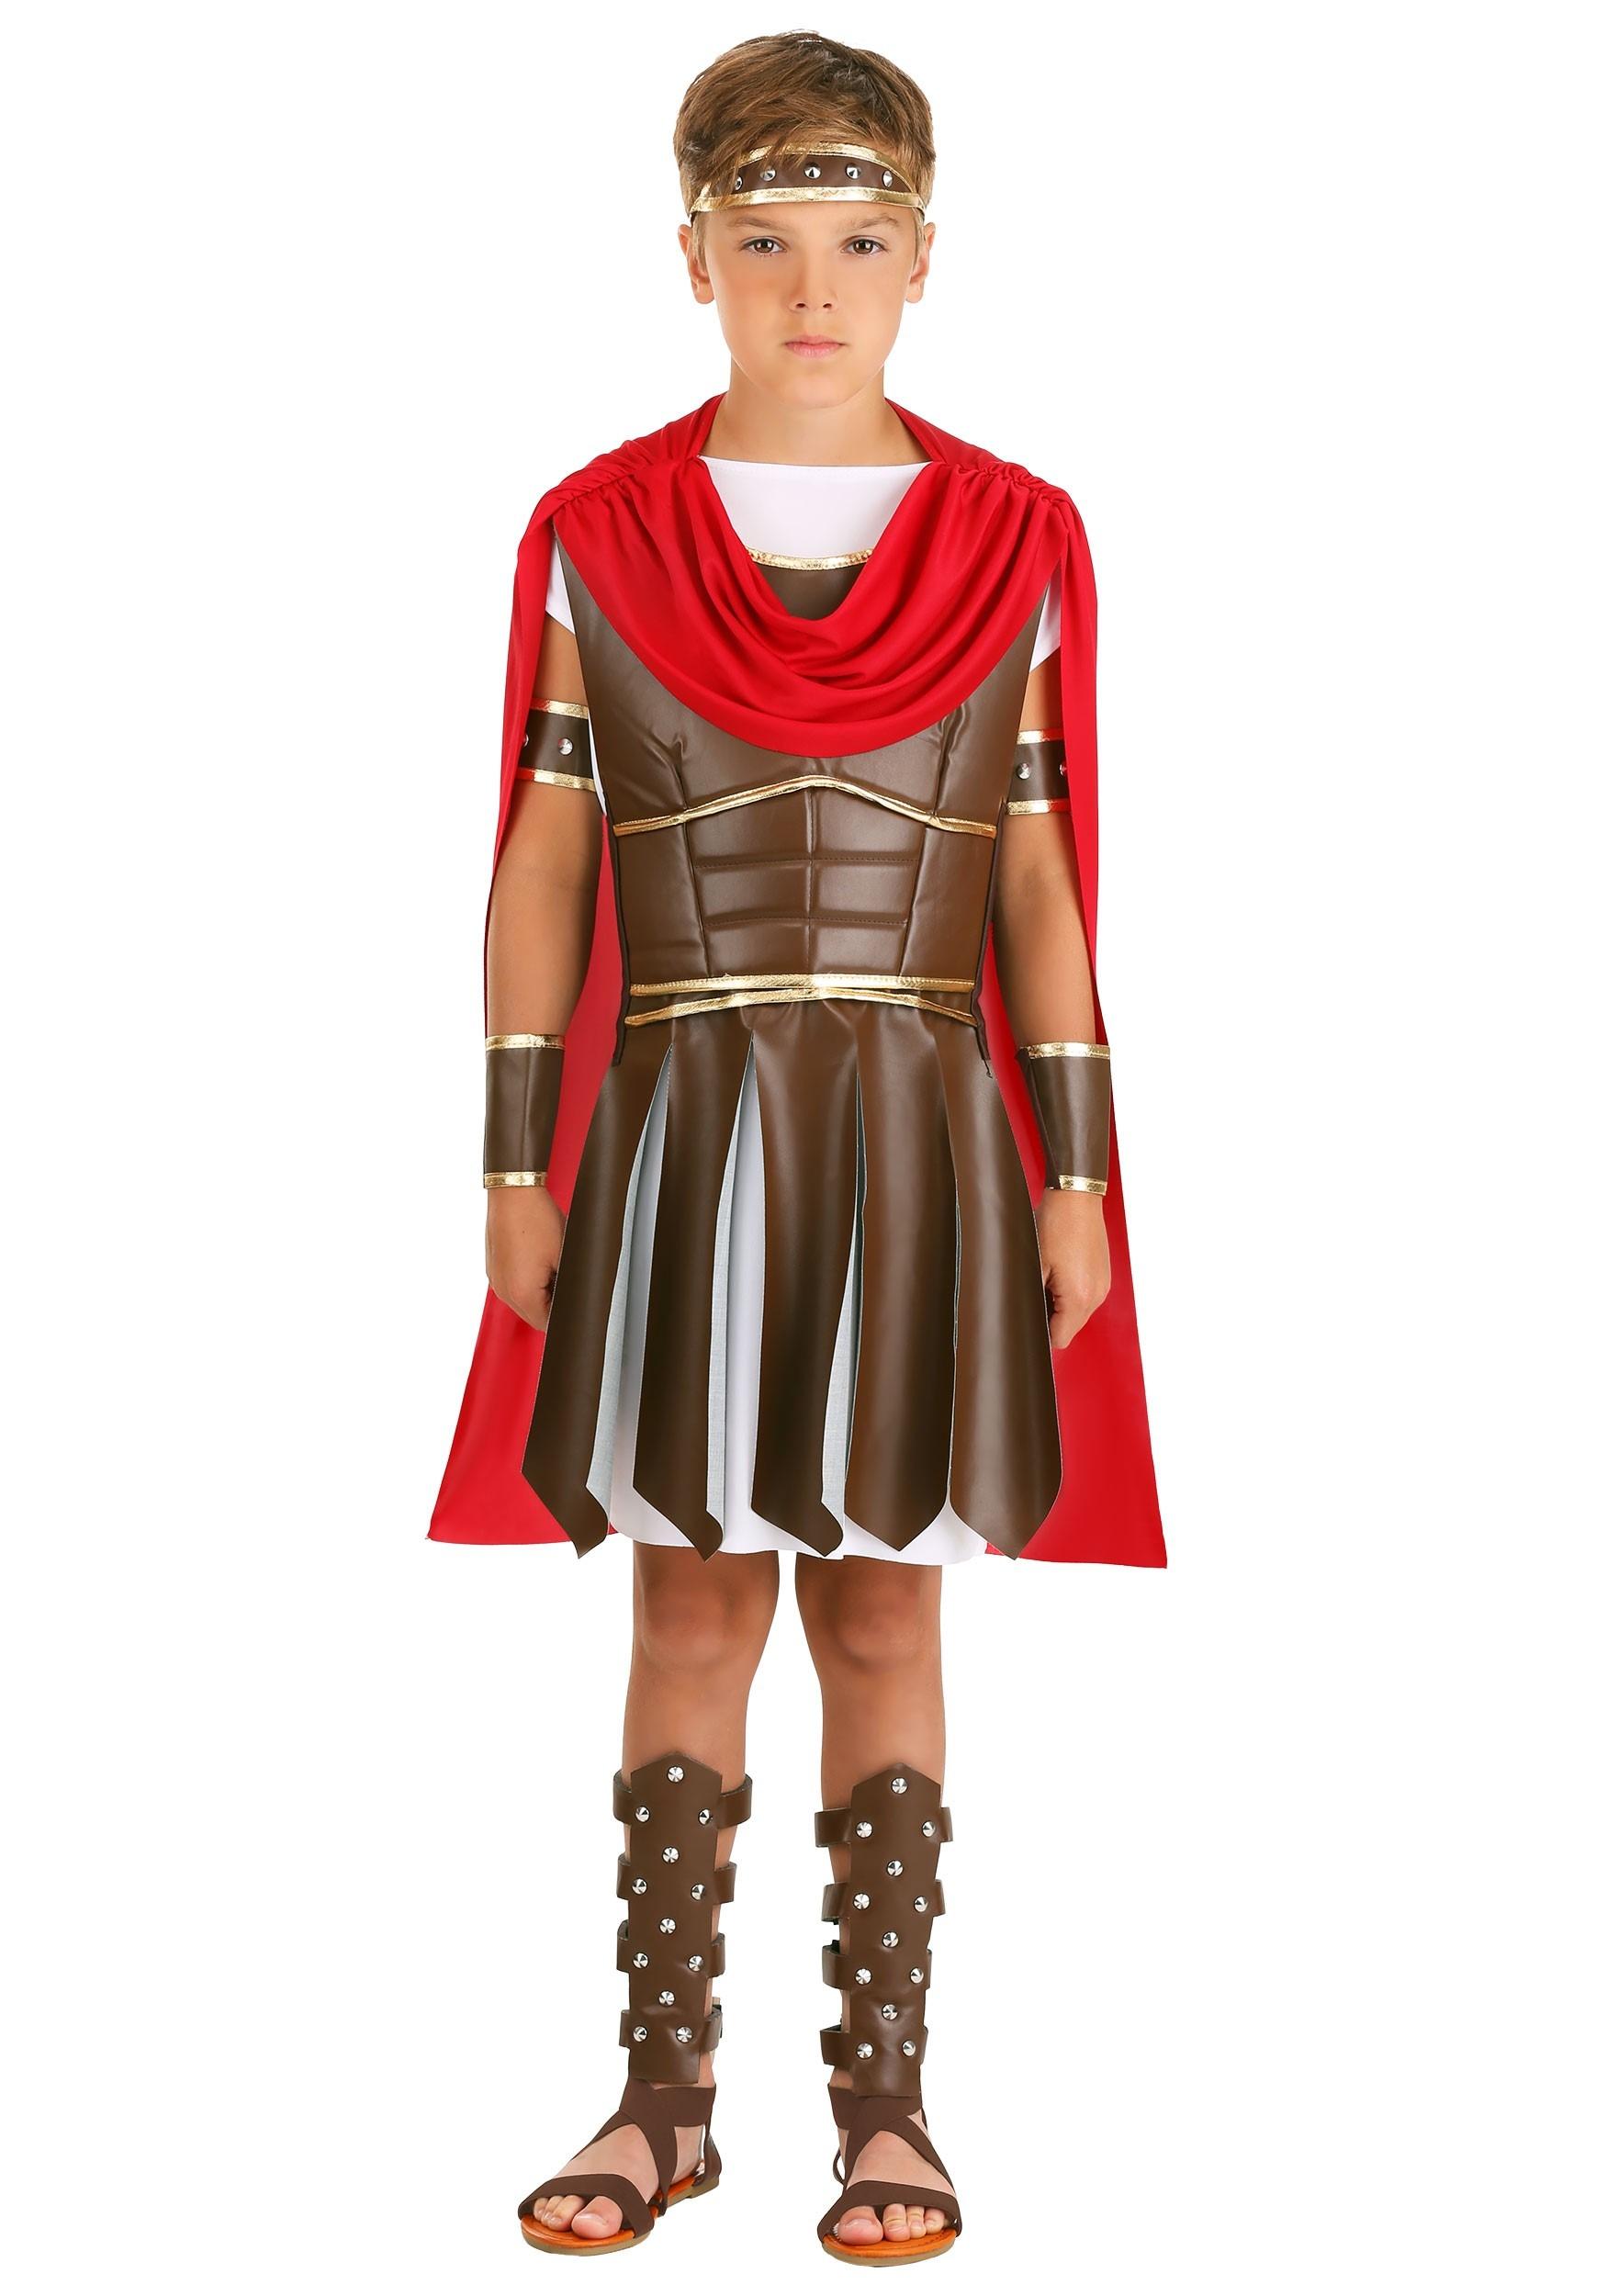 Kids Hercules Costume - Kids Roman Warrior Costumes